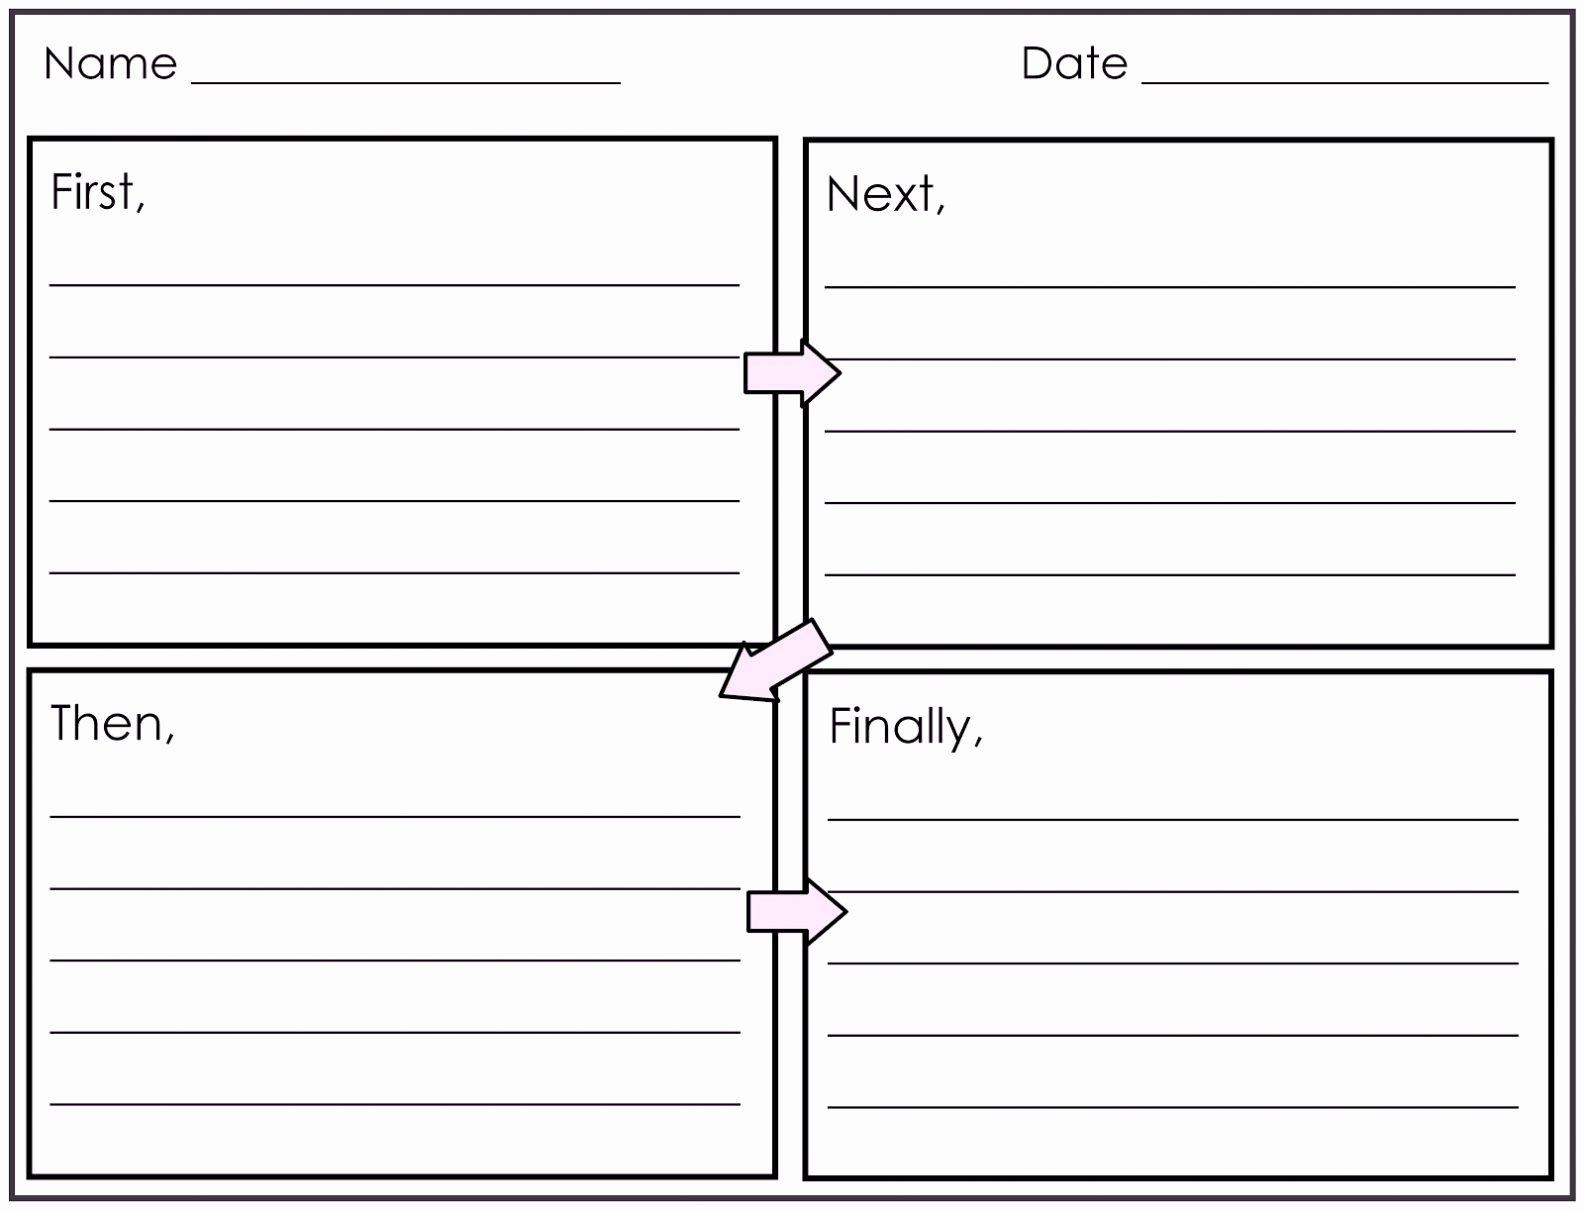 Free Printable Rubric Template Elegant Blank Grading & Project Rubric Template Word Doc